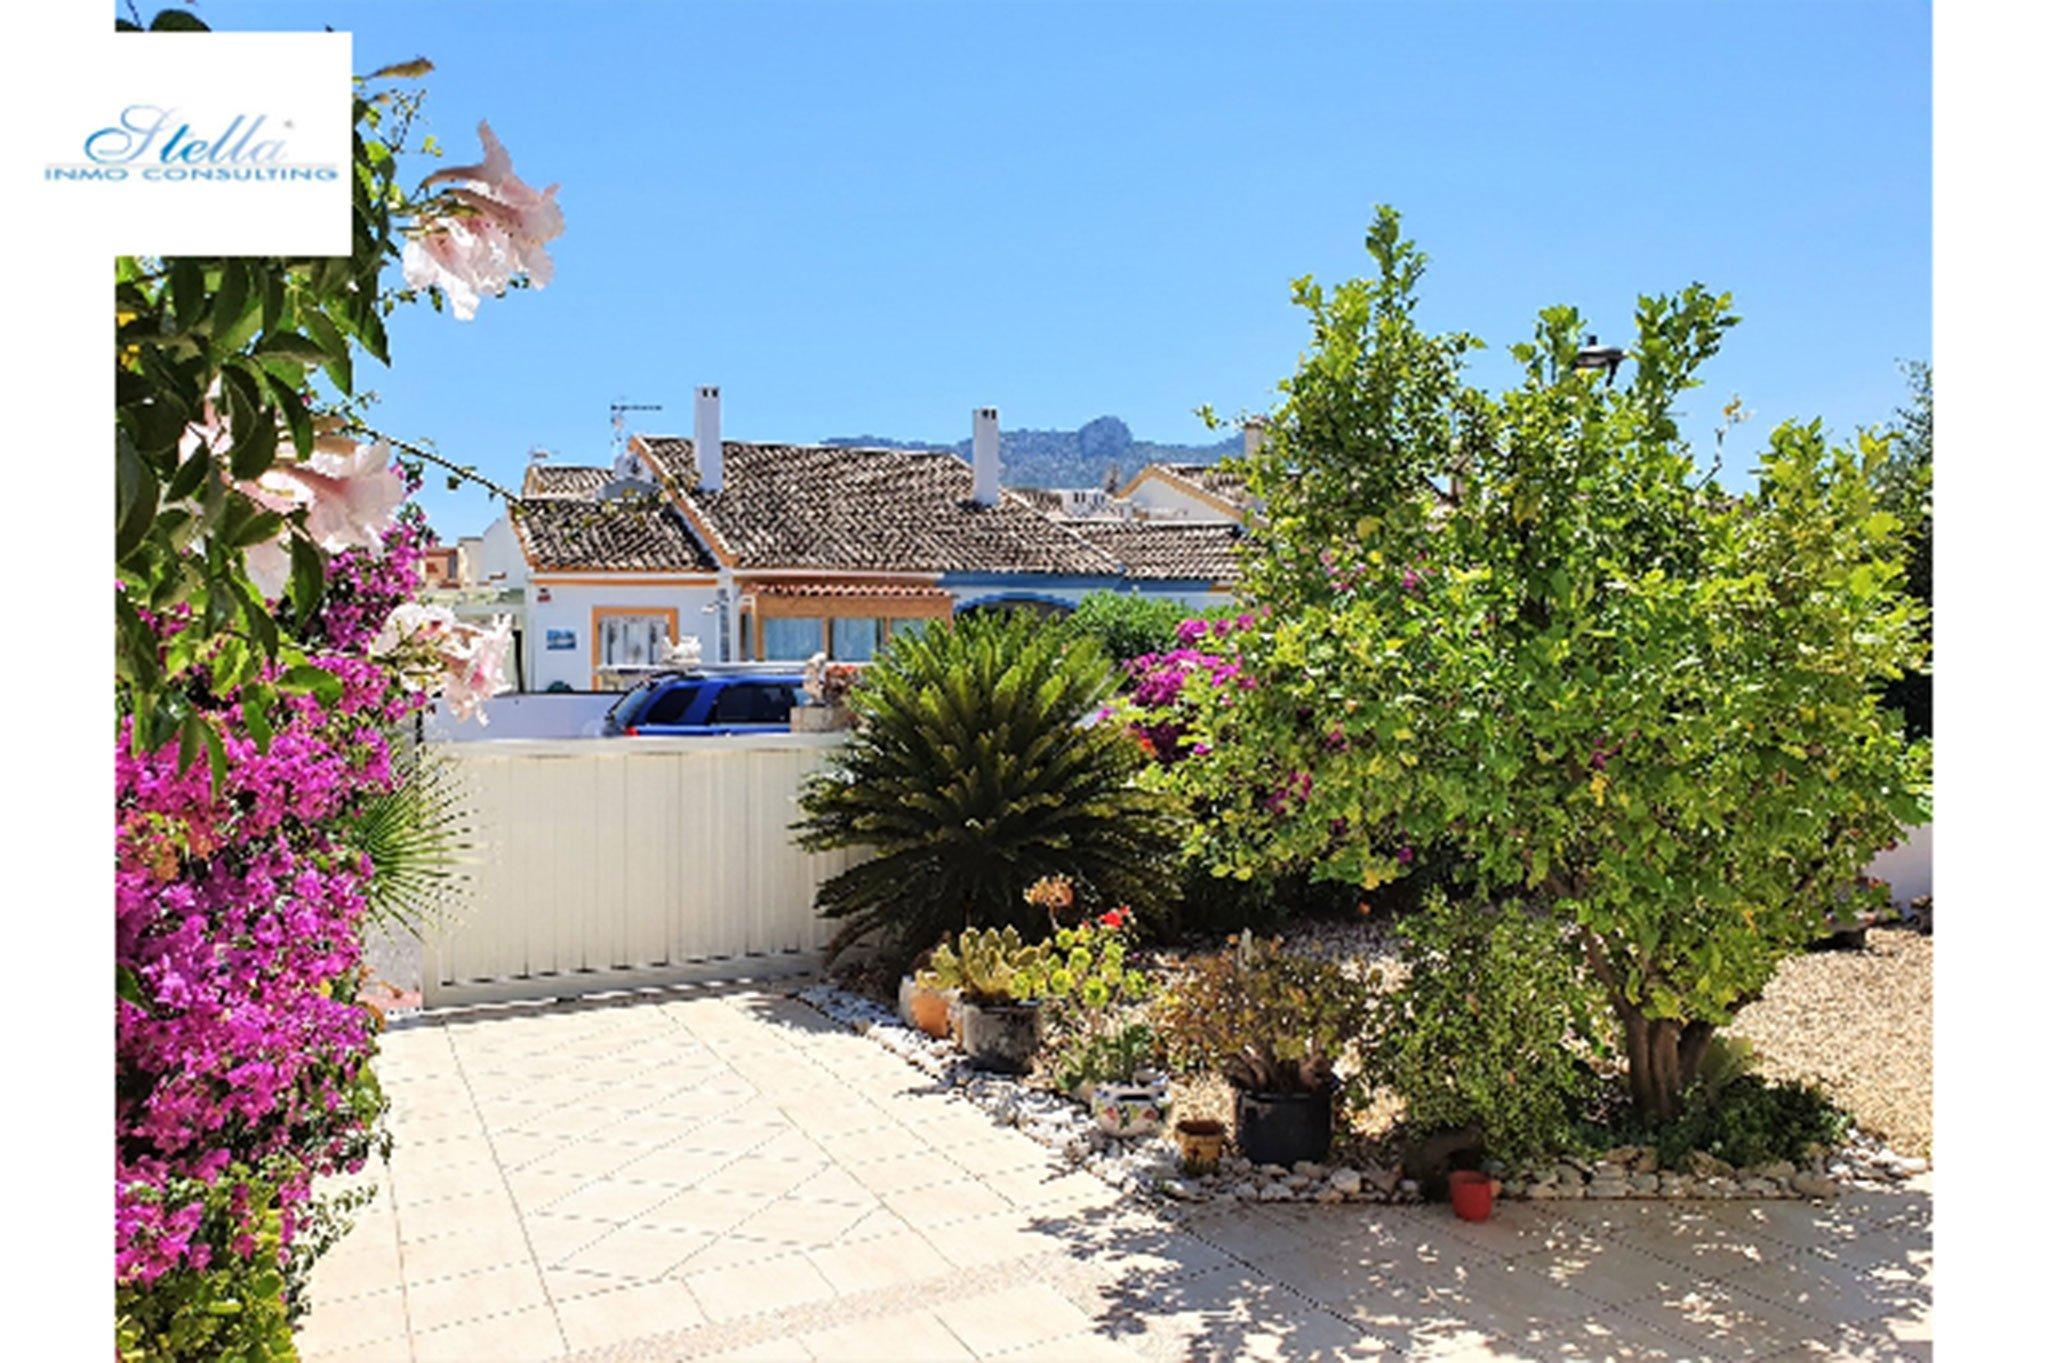 Vista exterior d'una casa en venda a Verger - Stella Inmo Consulting